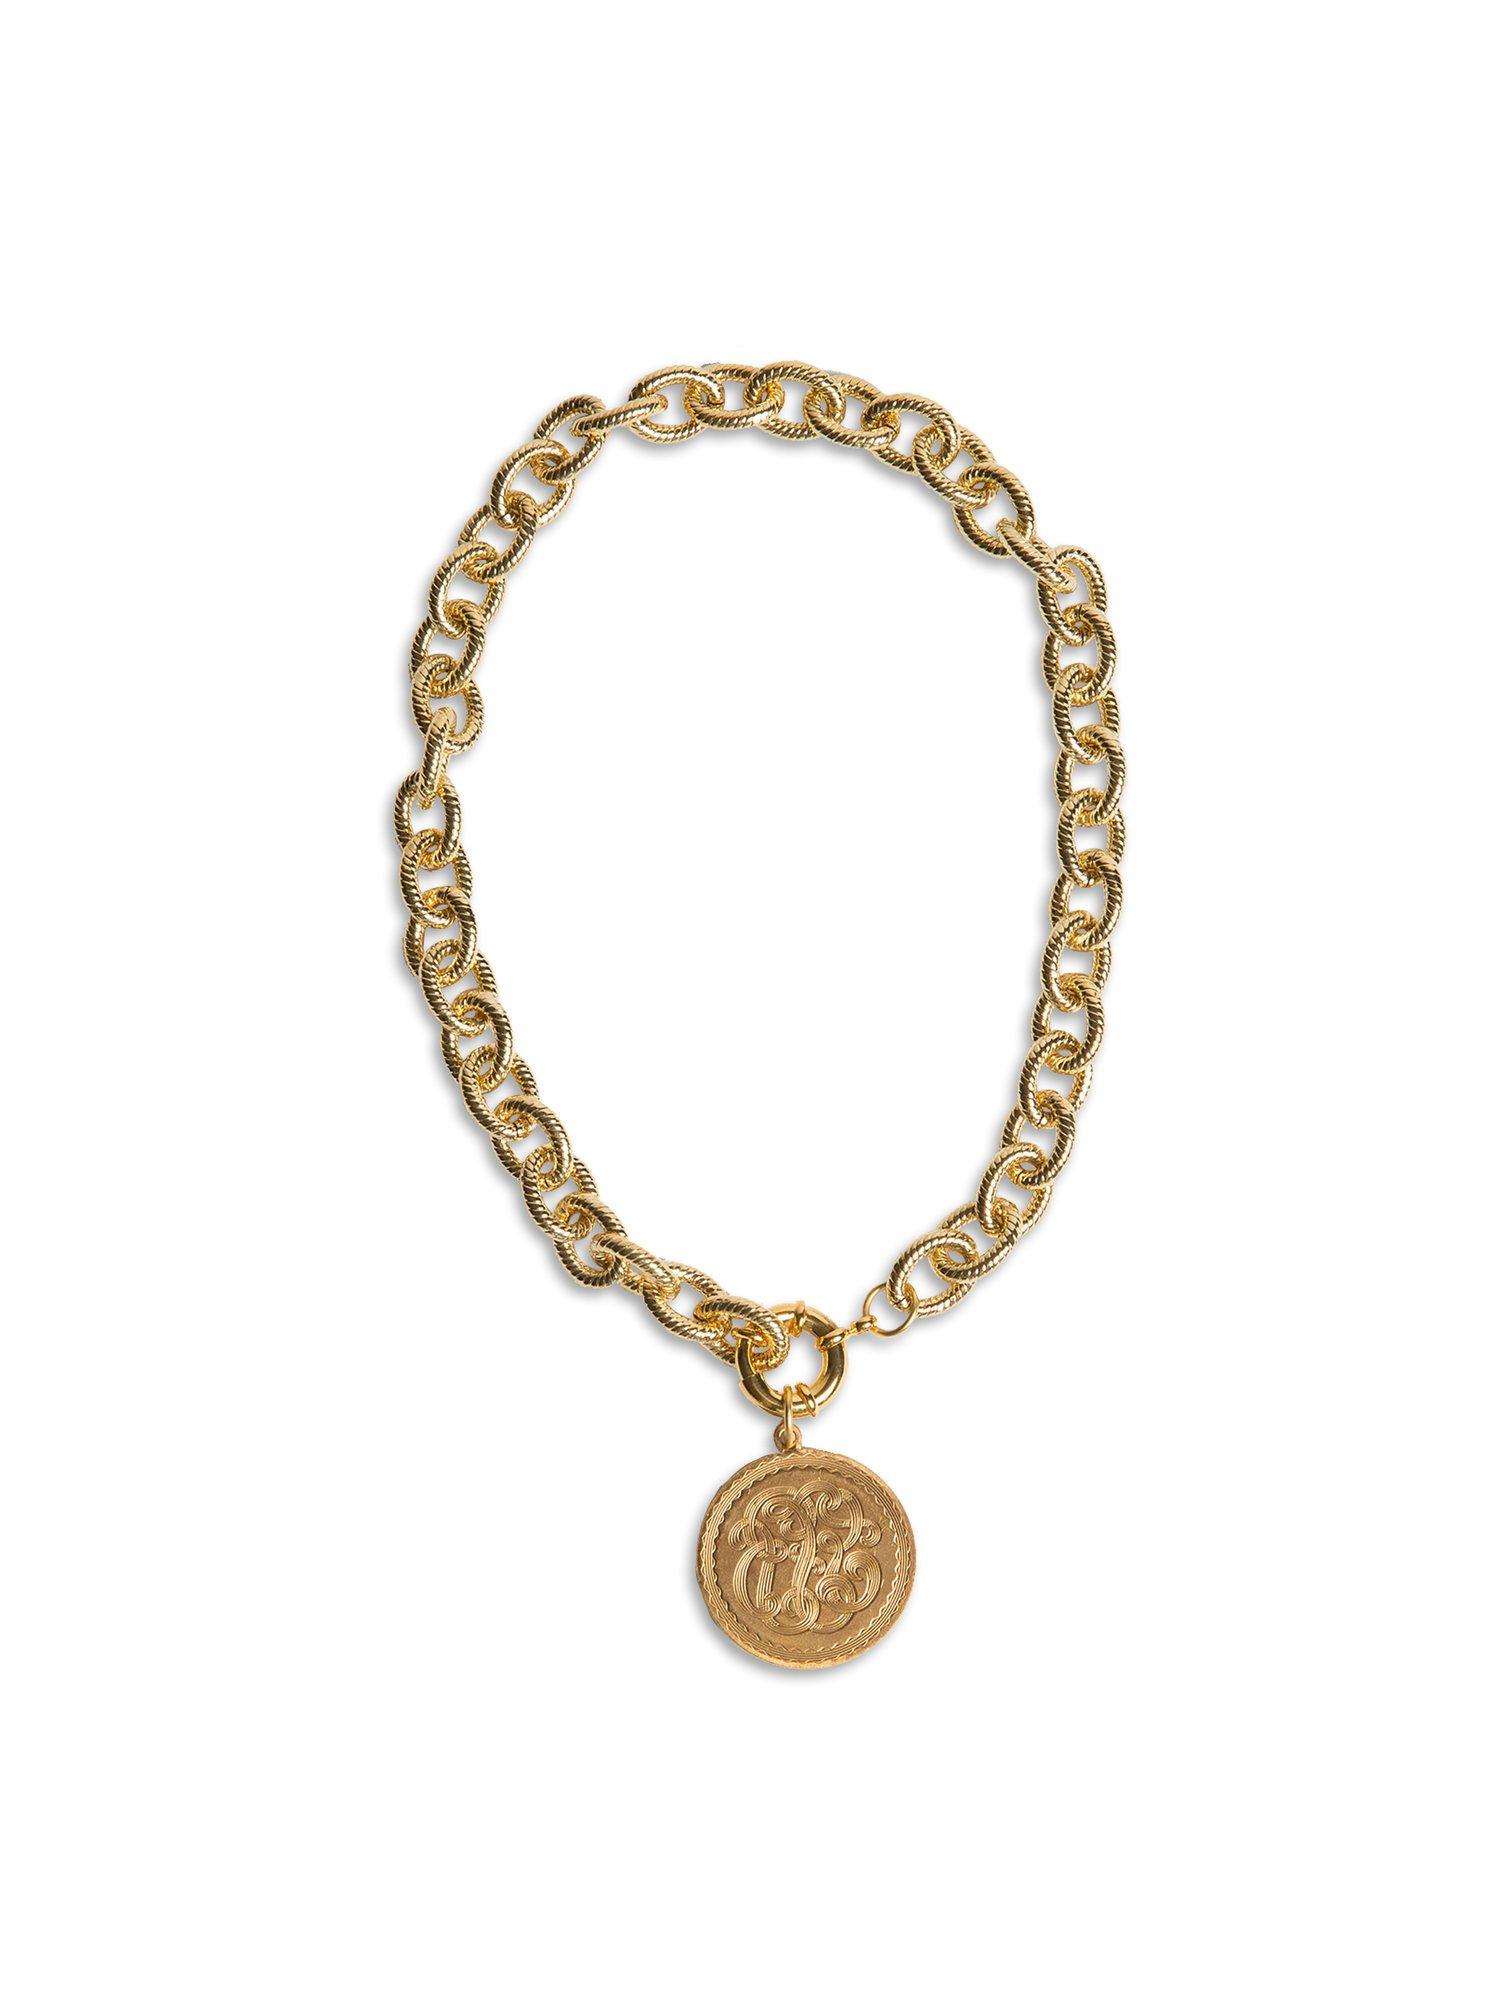 Hypso Paris Chain necklace